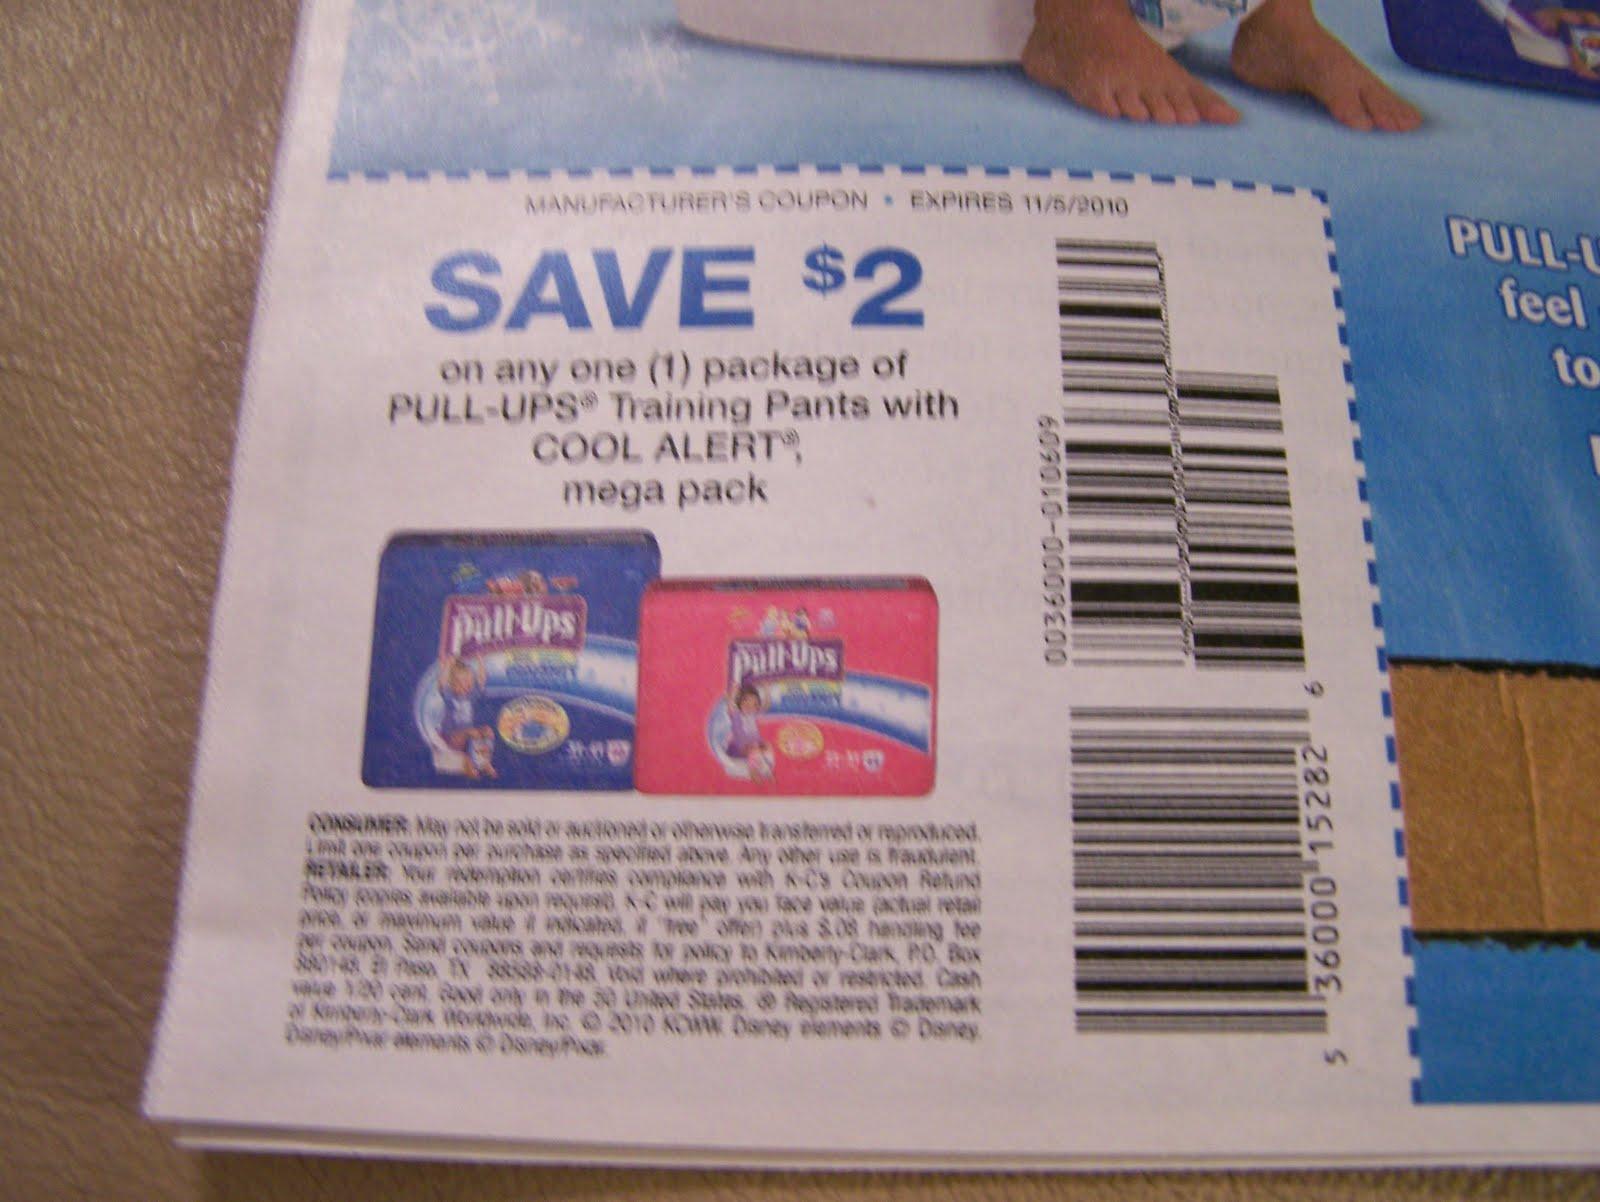 Centsible Savings: 4 Readers Win (4) $2.00/1 Pullups Coupons - Free Printable Coupons For Huggies Pull Ups